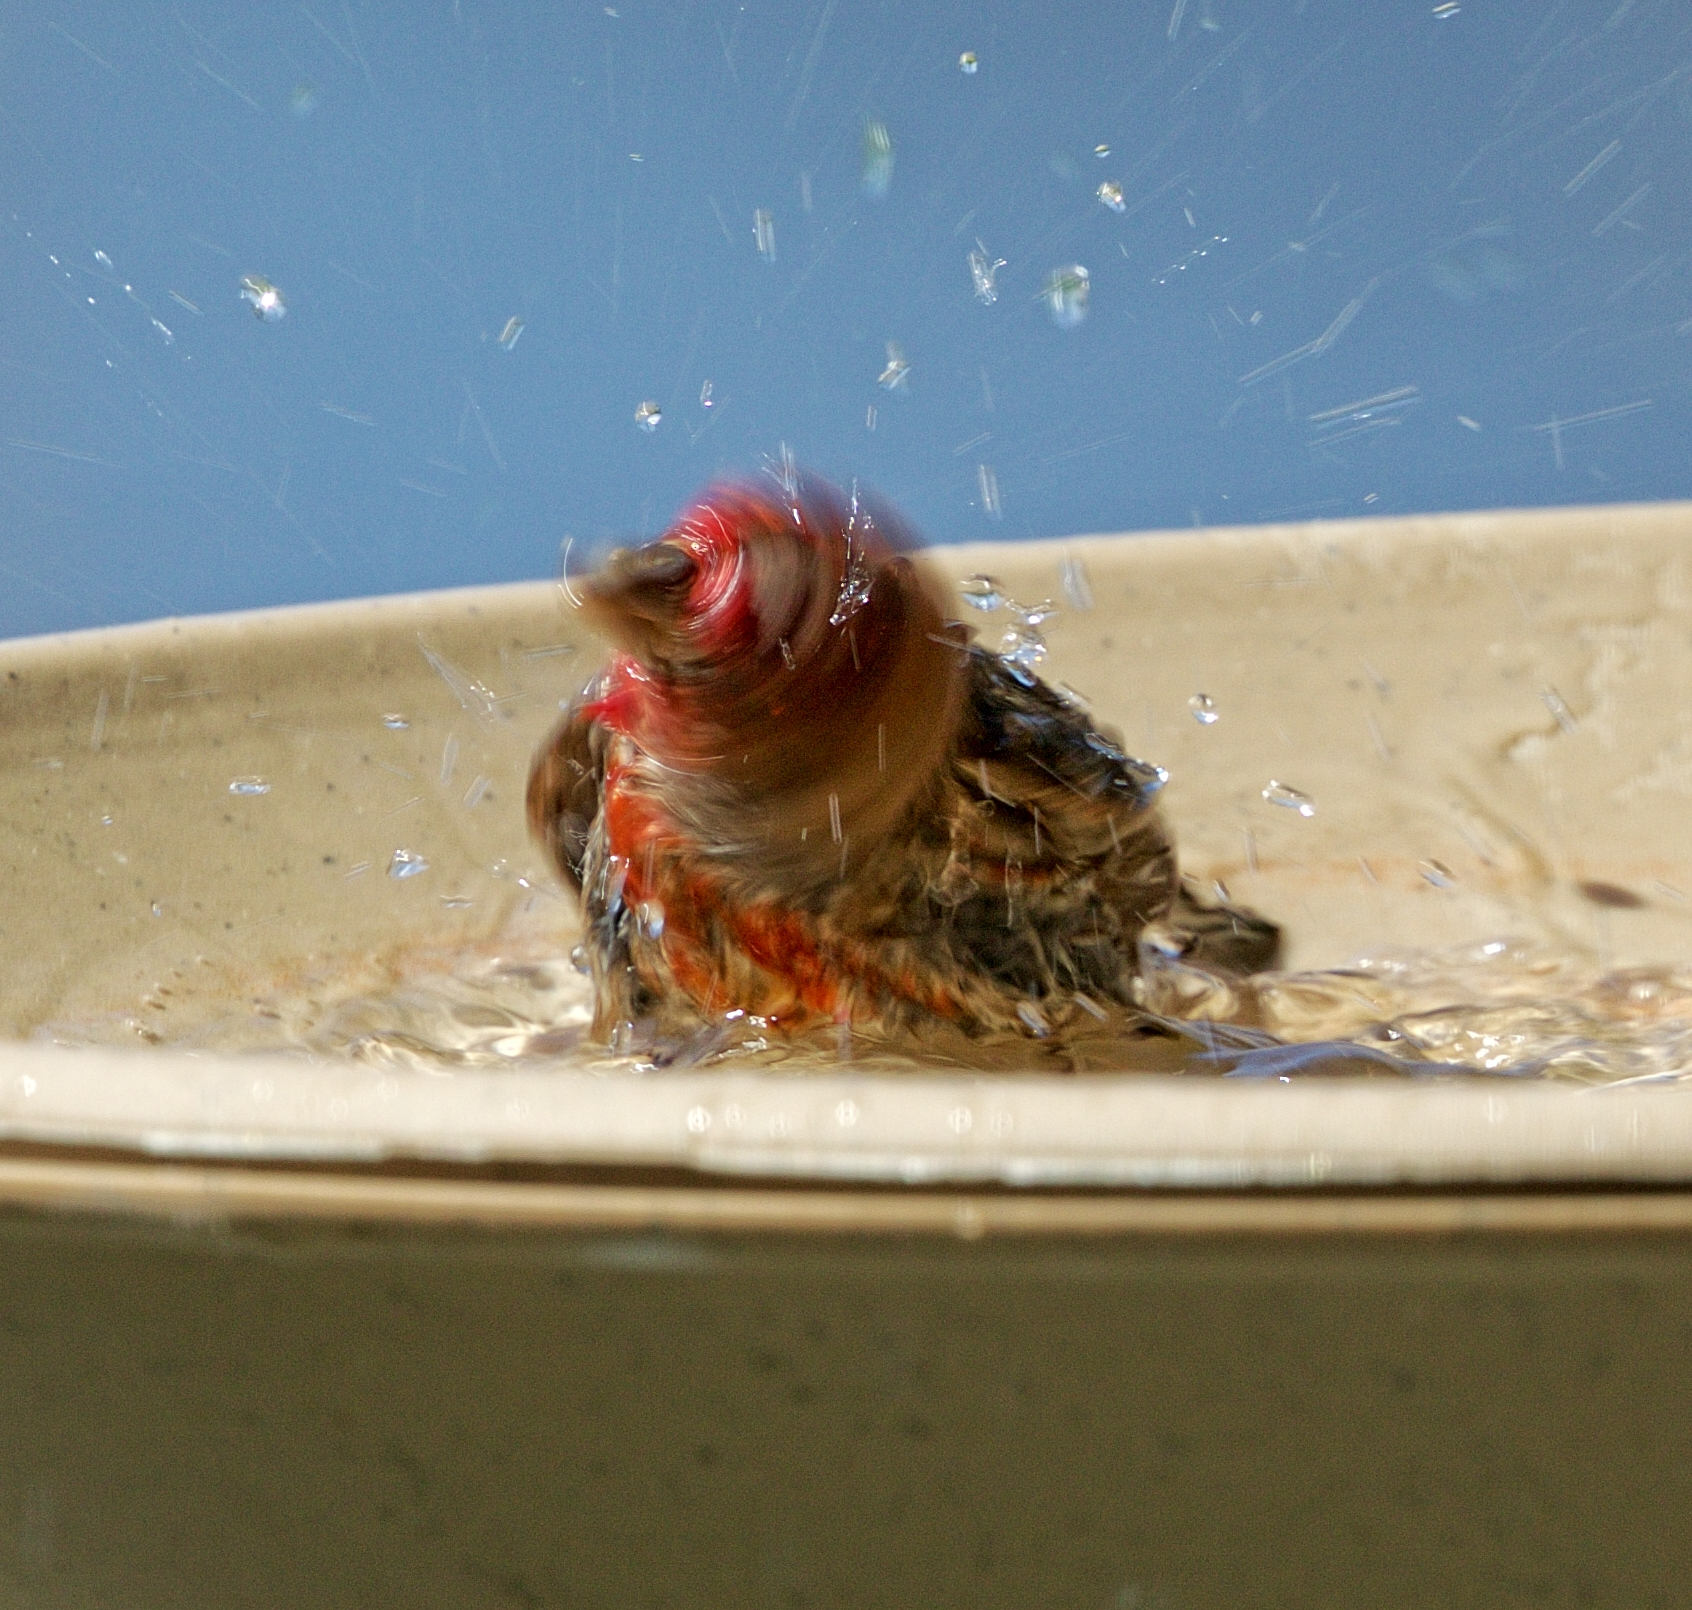 Blllltttt.....shaking it off..in the bird bath..